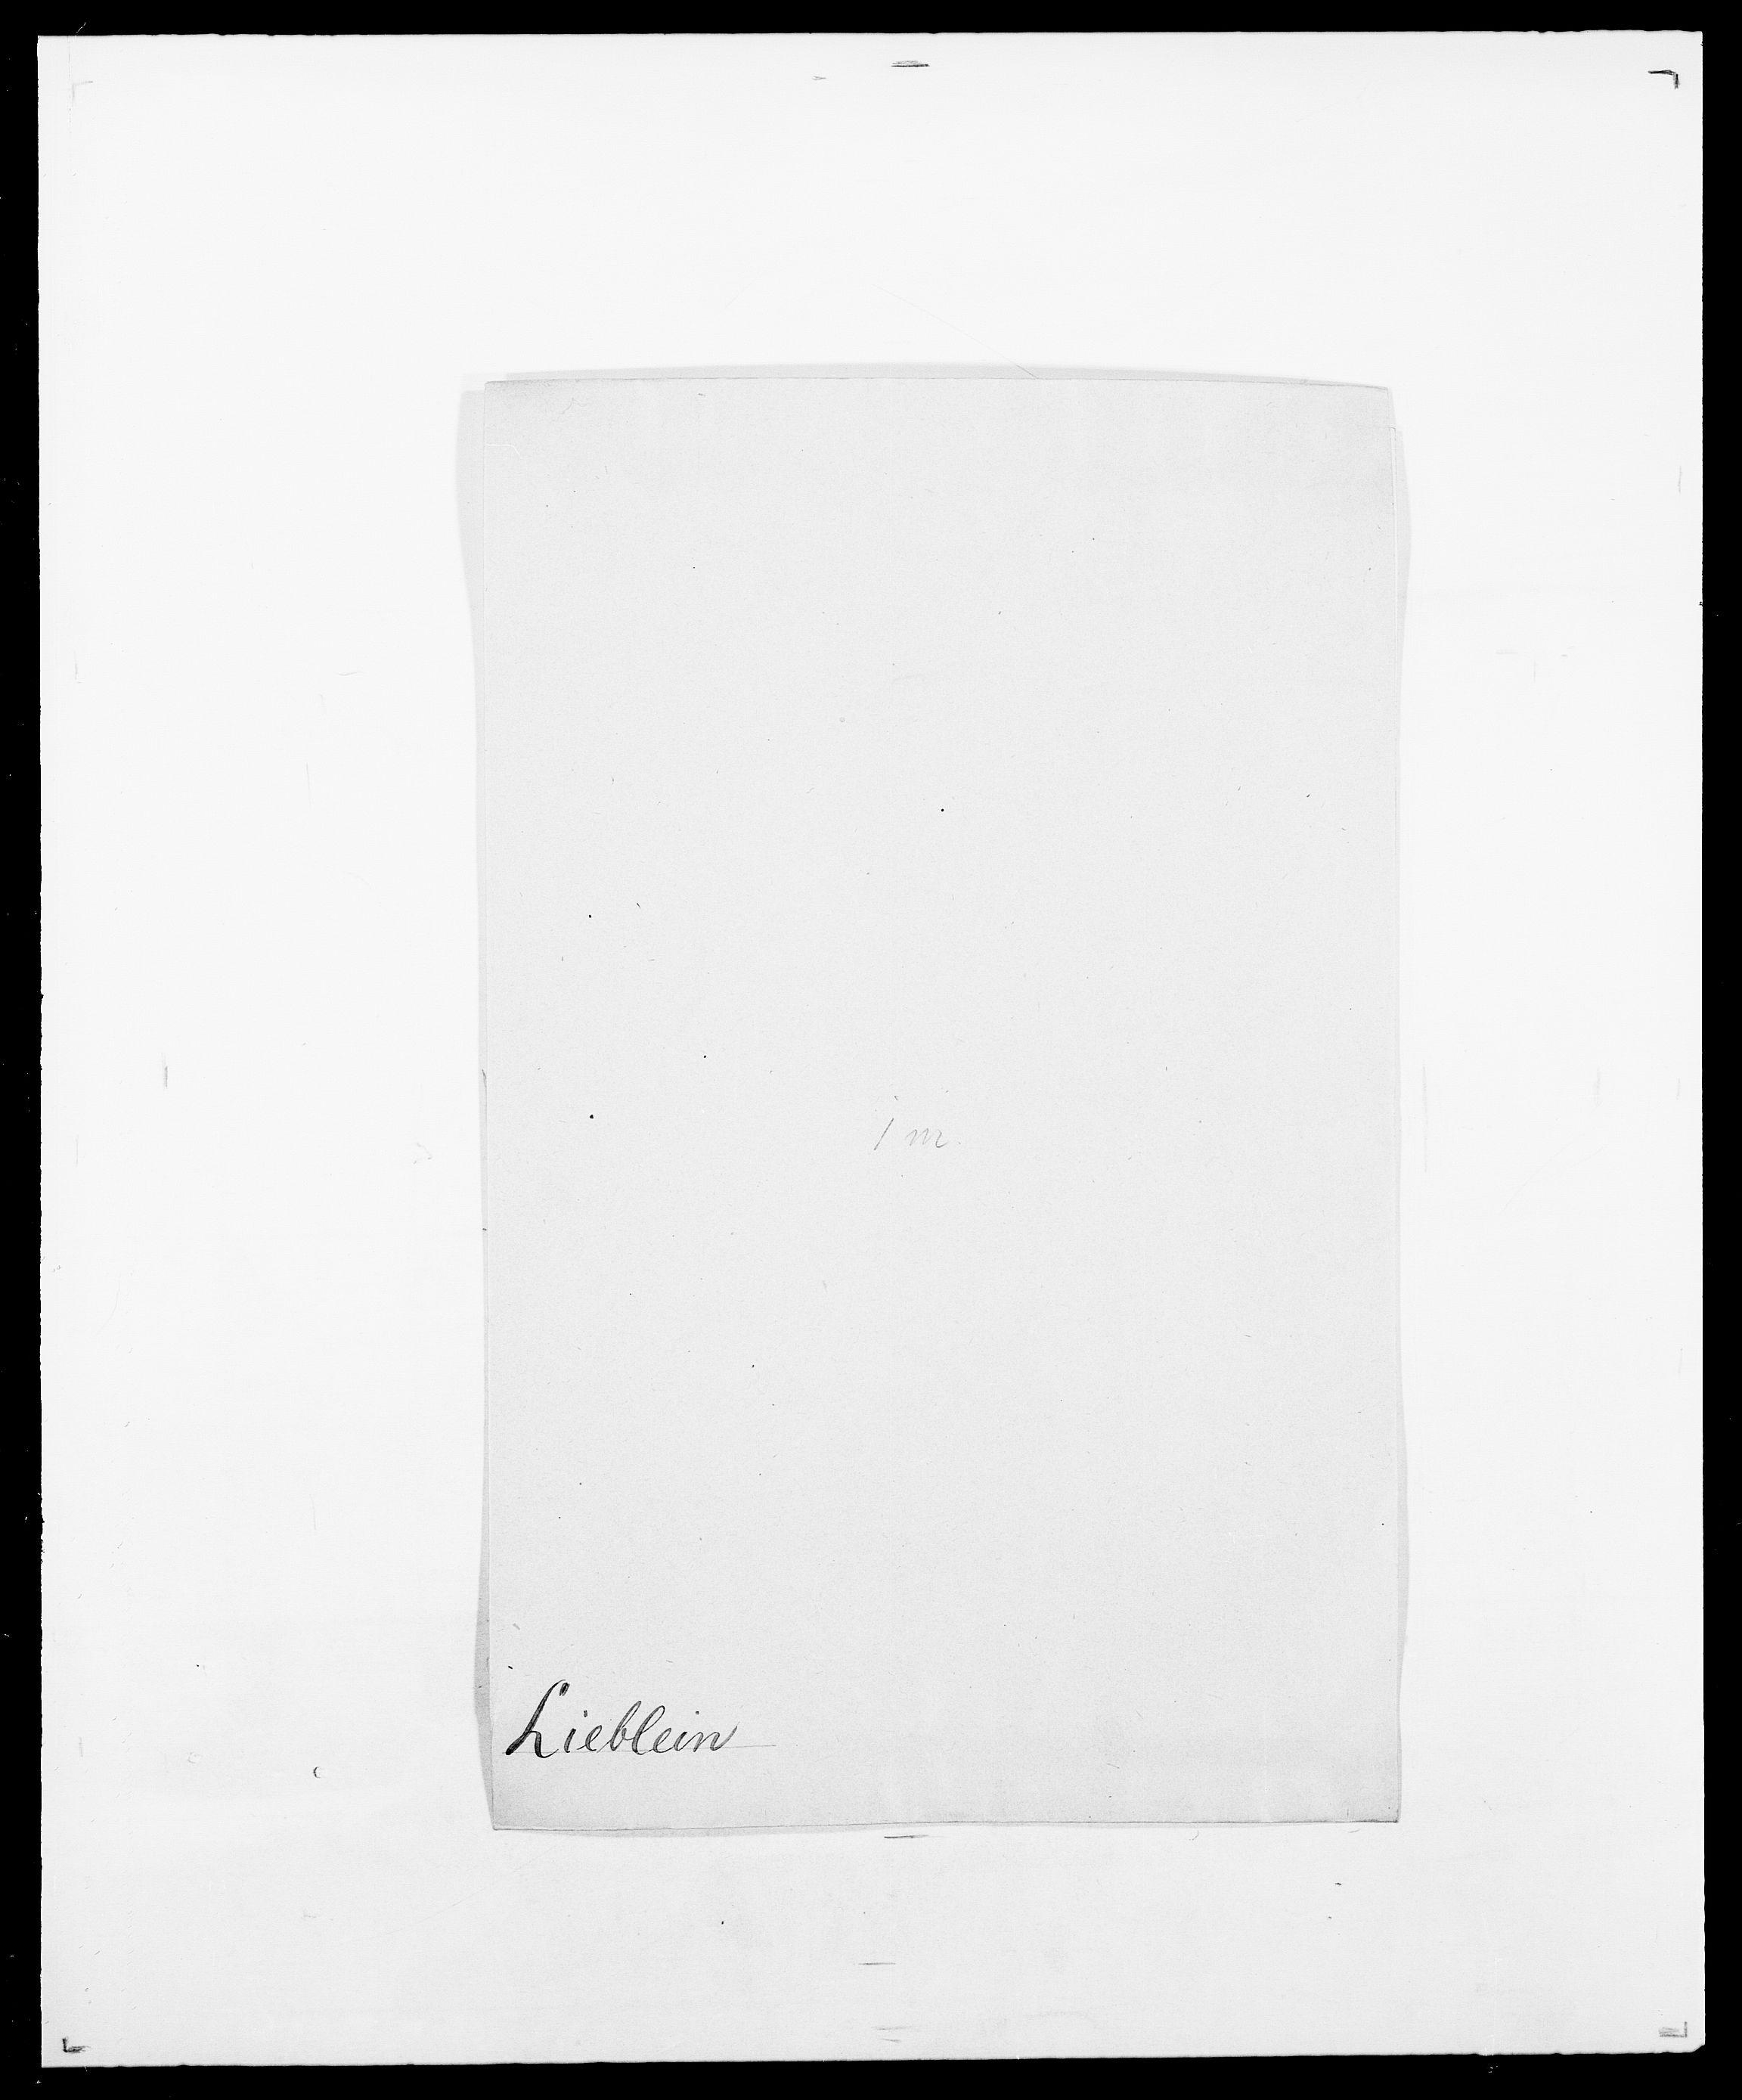 SAO, Delgobe, Charles Antoine - samling, D/Da/L0023: Lau - Lirvyn, s. 364